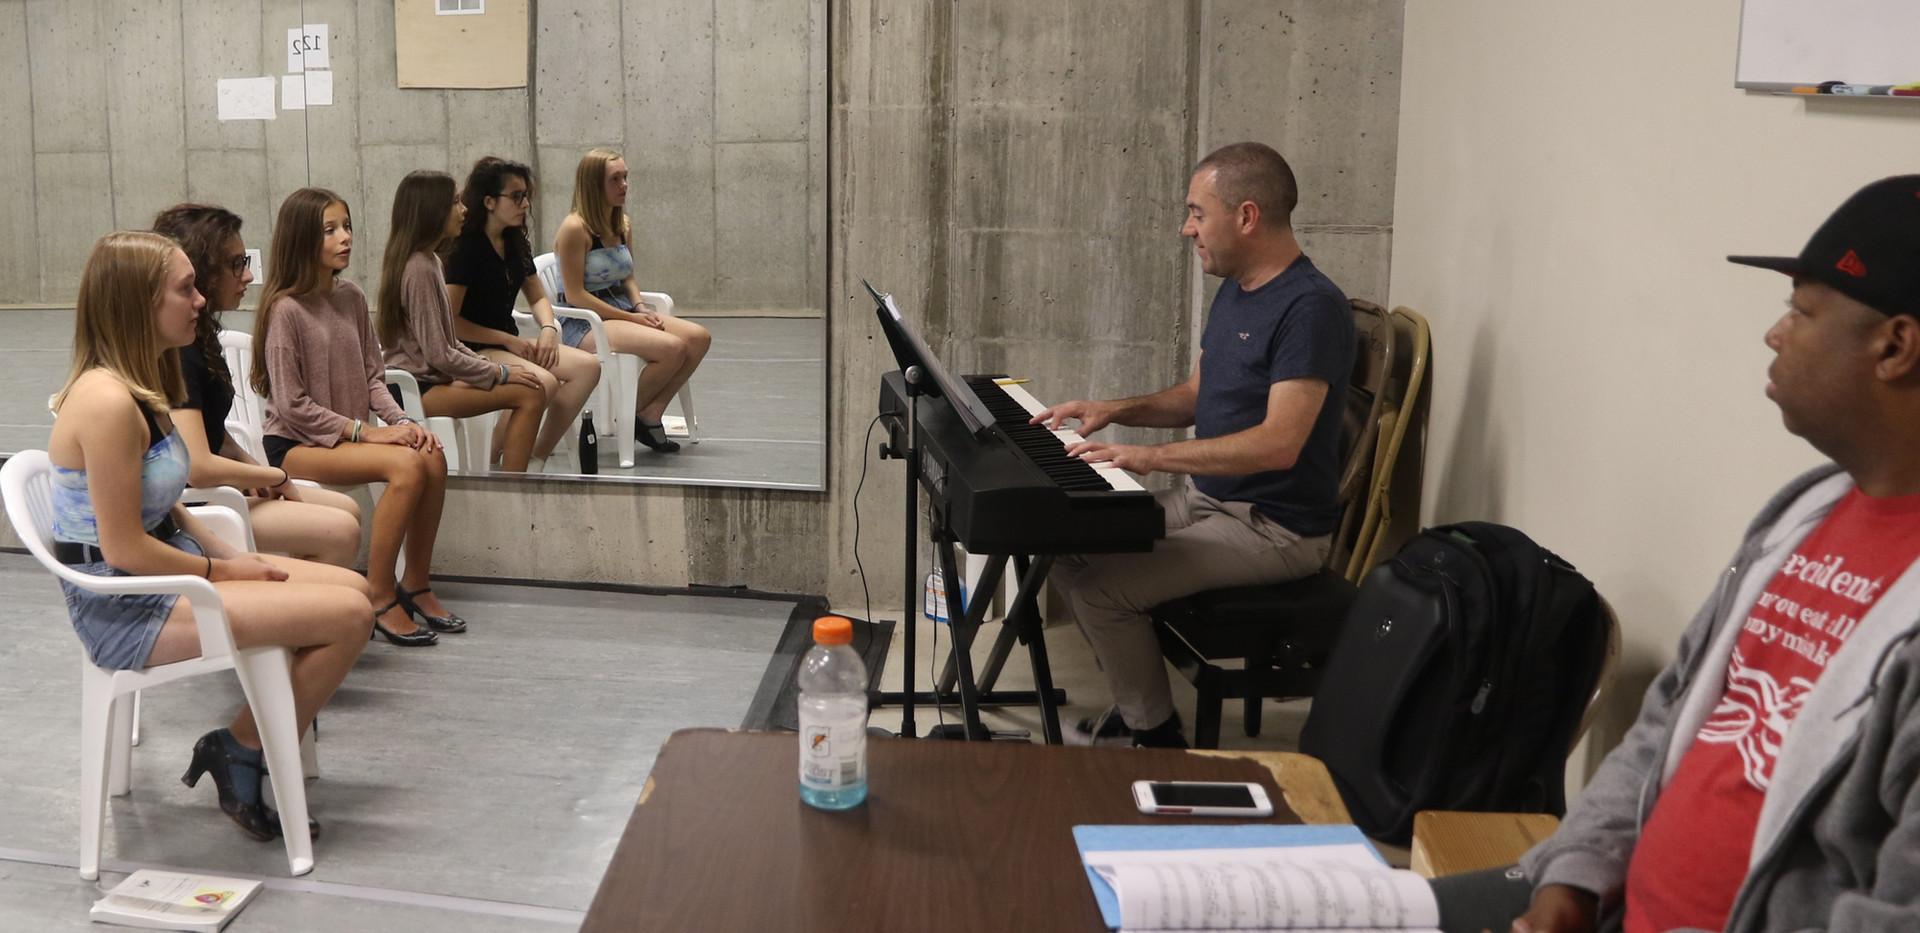 Music rehearsal